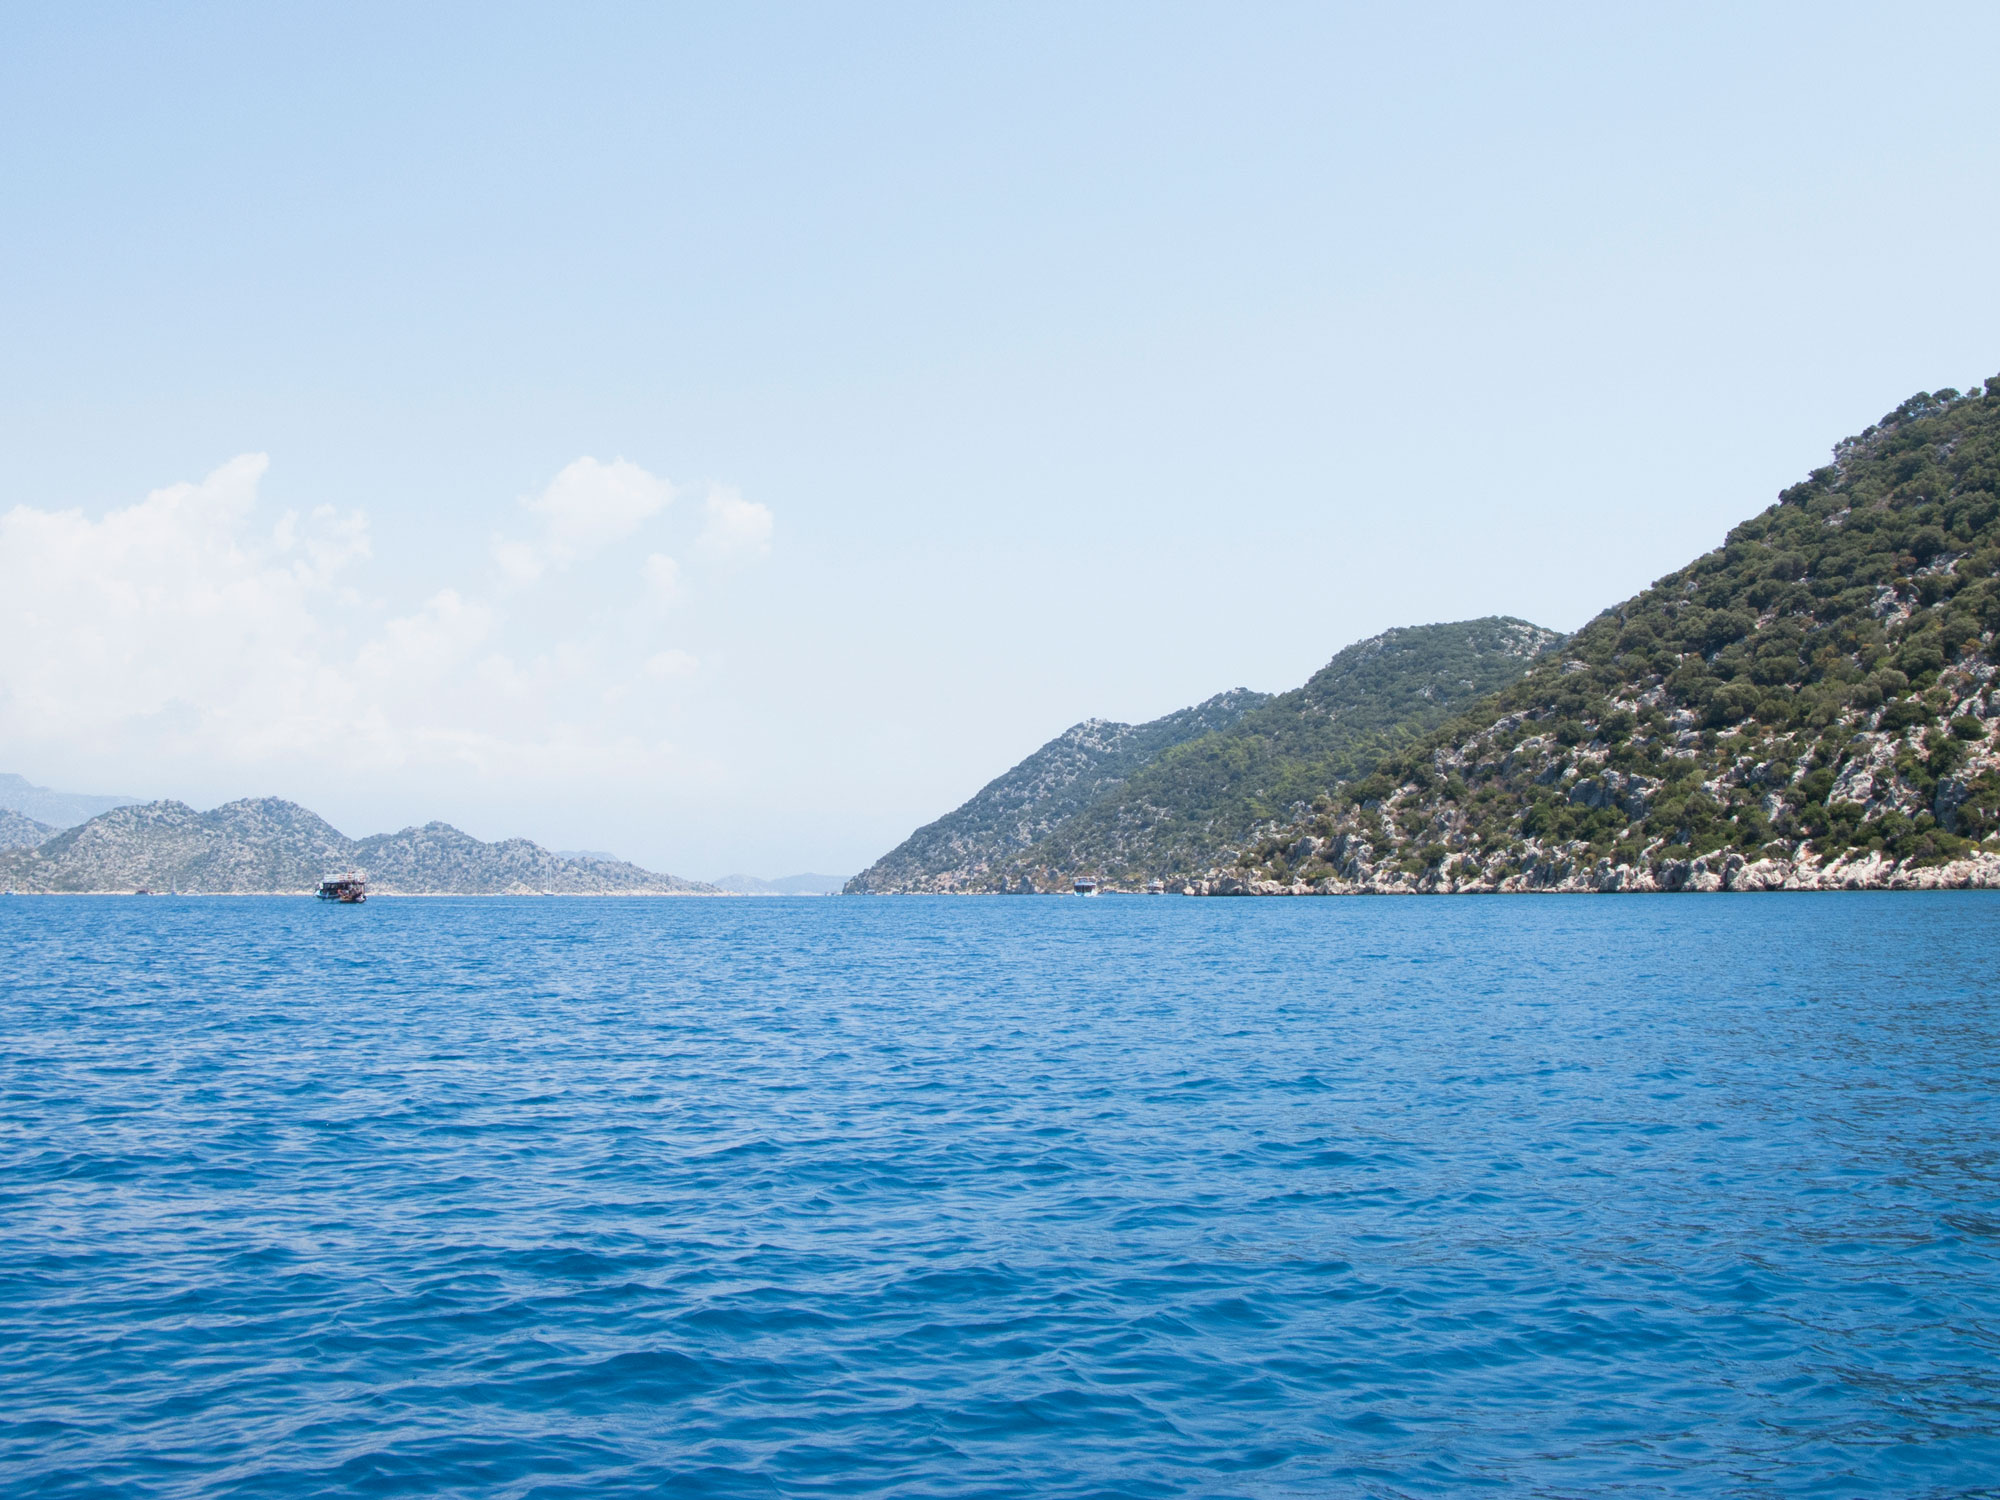 Turkey Ucagiz Kekova island sea